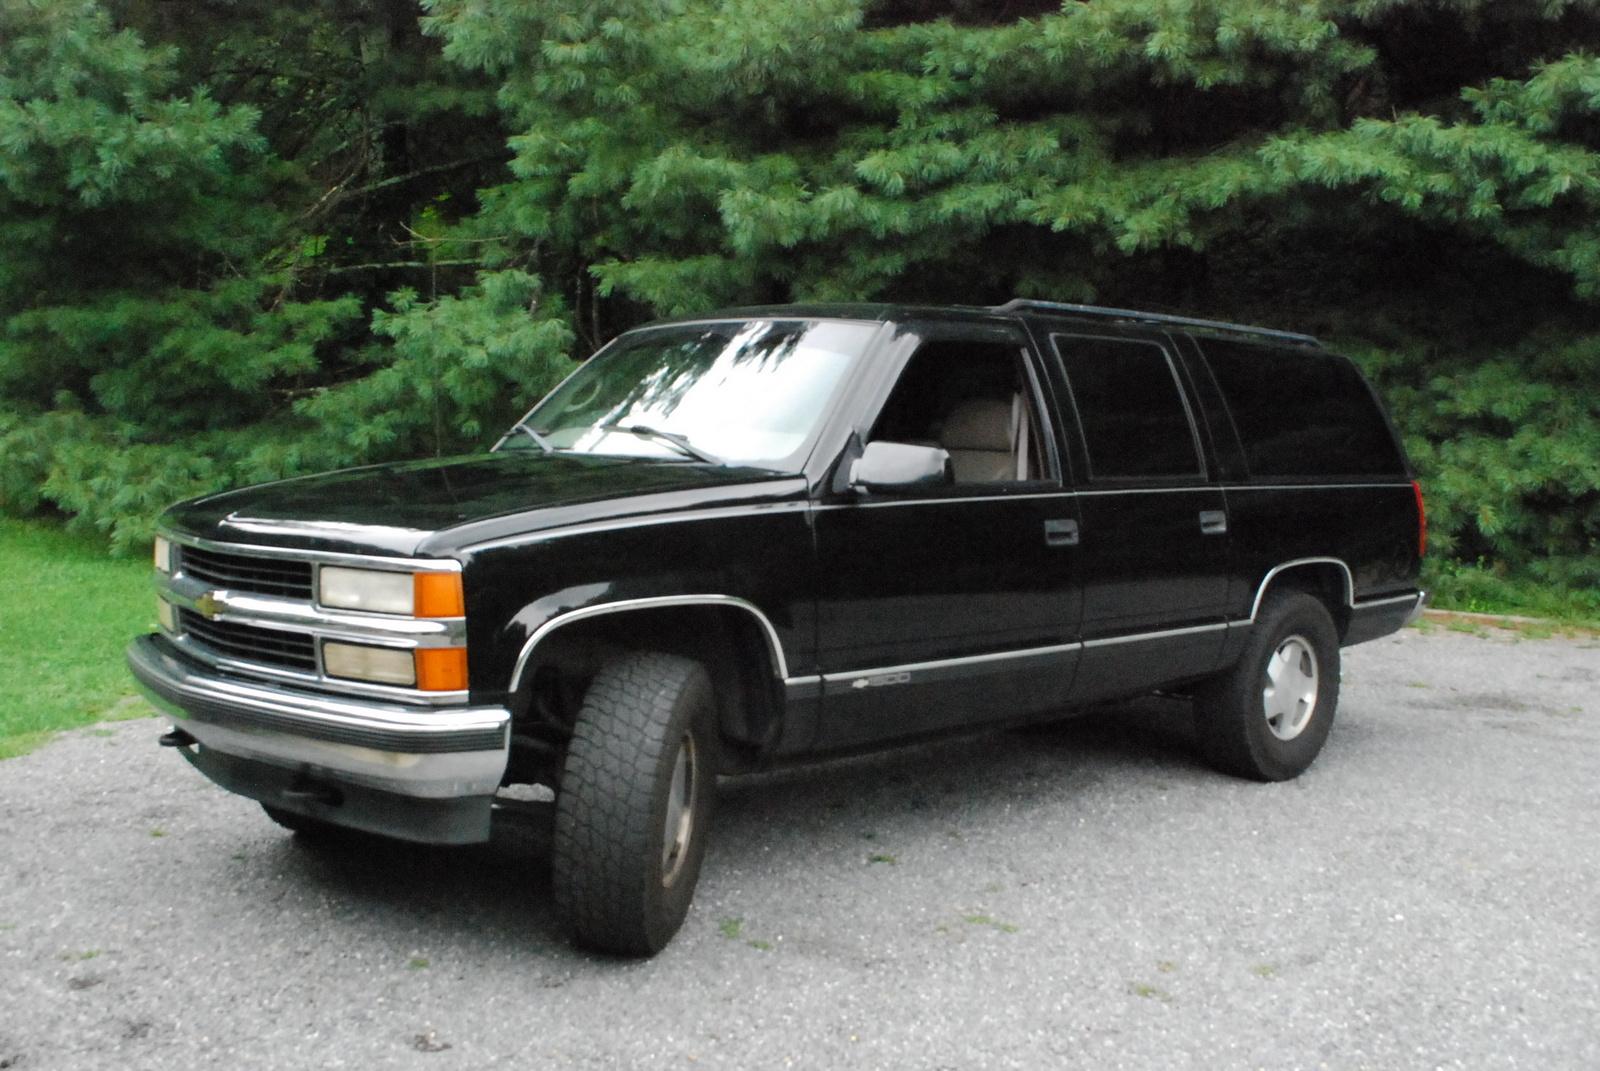 Chevrolet Suburban 1998 foto - 1